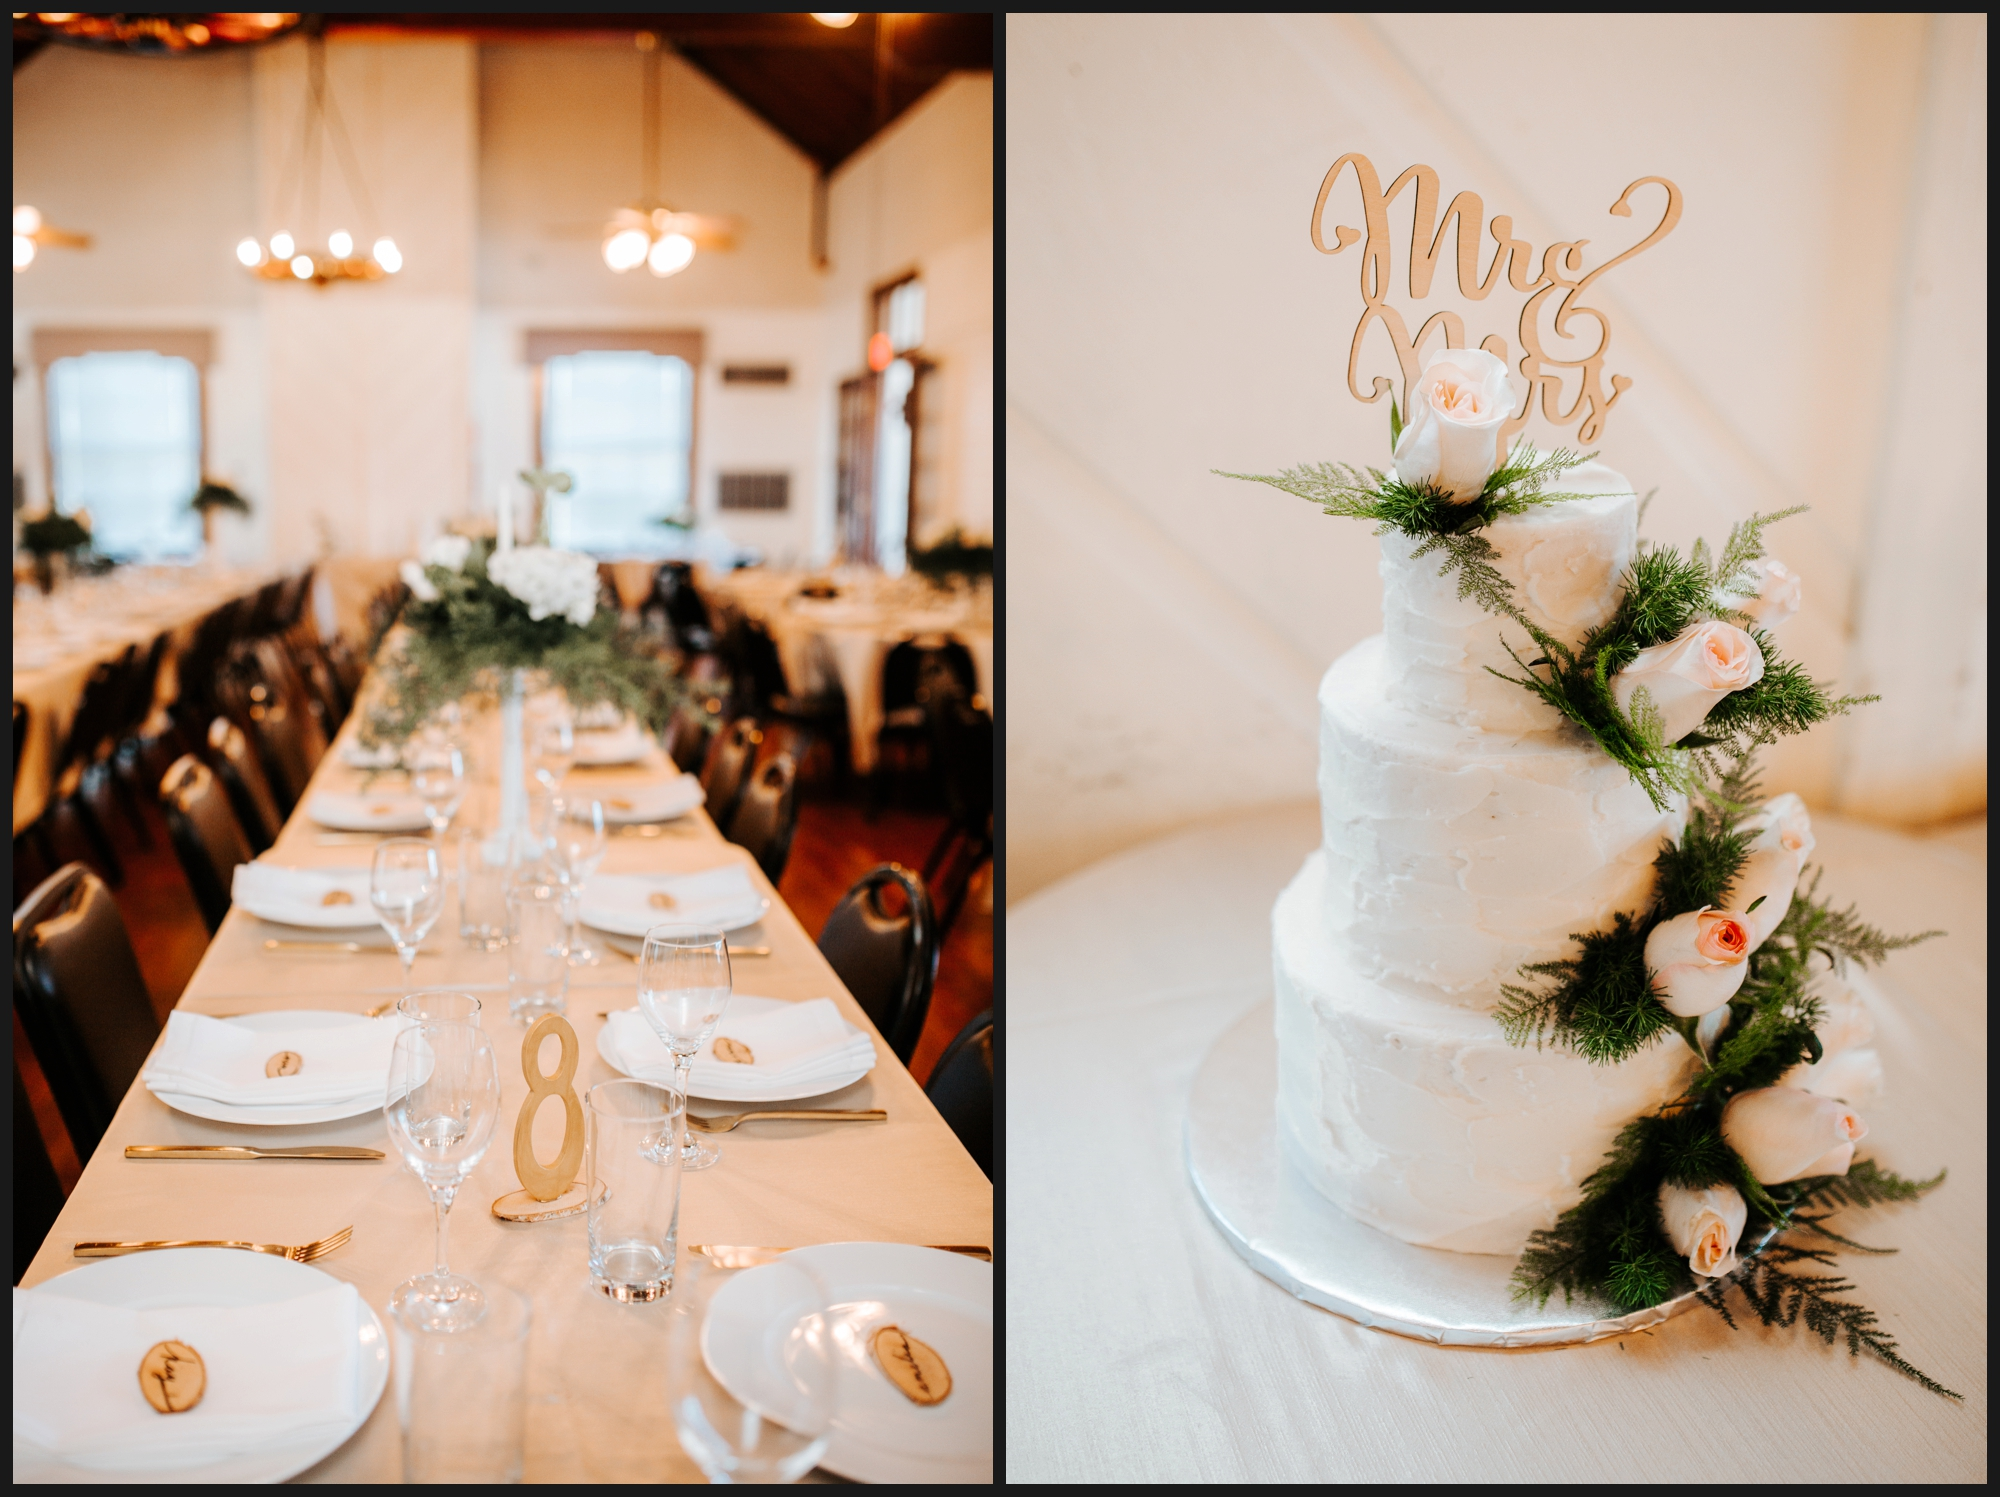 Orlando-Wedding-Photographer-destination-wedding-photographer-florida-wedding-photographer-bohemian-wedding-photographer_0021.jpg